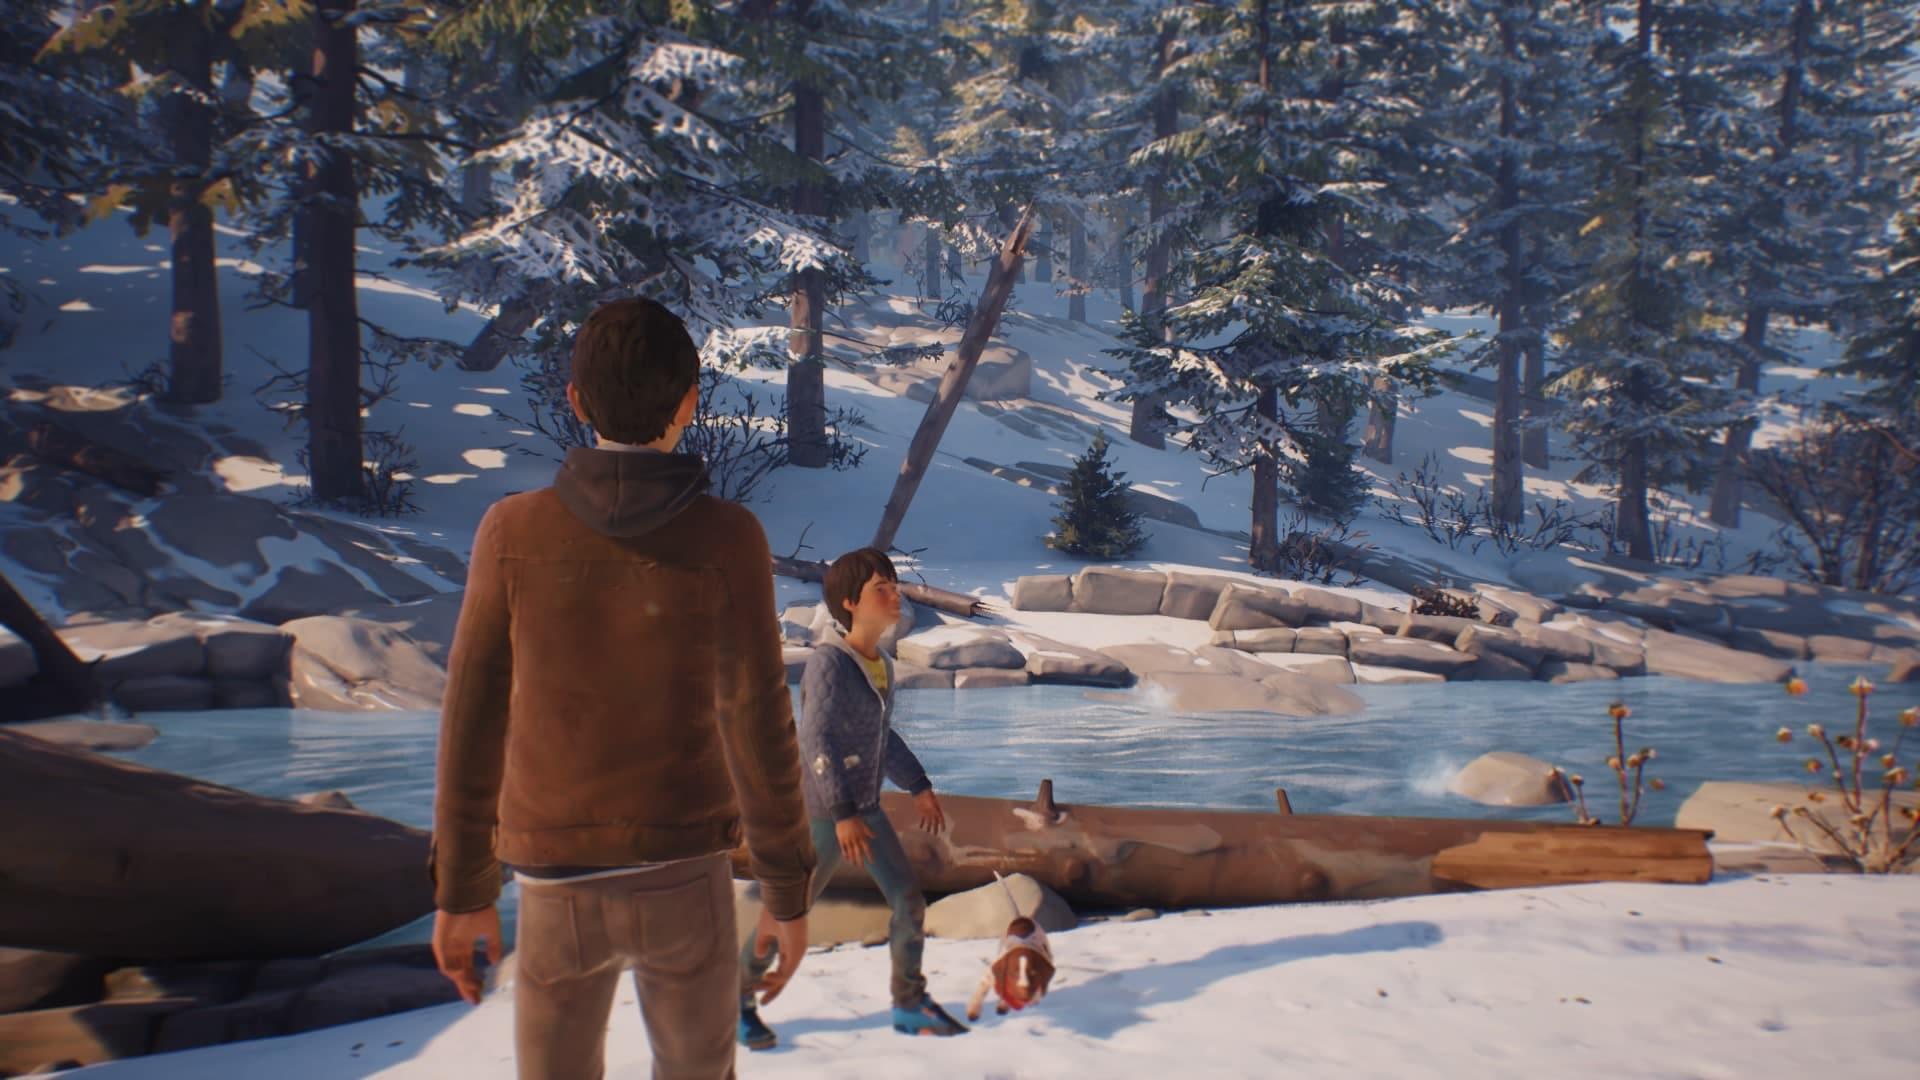 Life is Strange 2, Square Enix, Dontnod Entertainment, PS4, Xbox One, PC